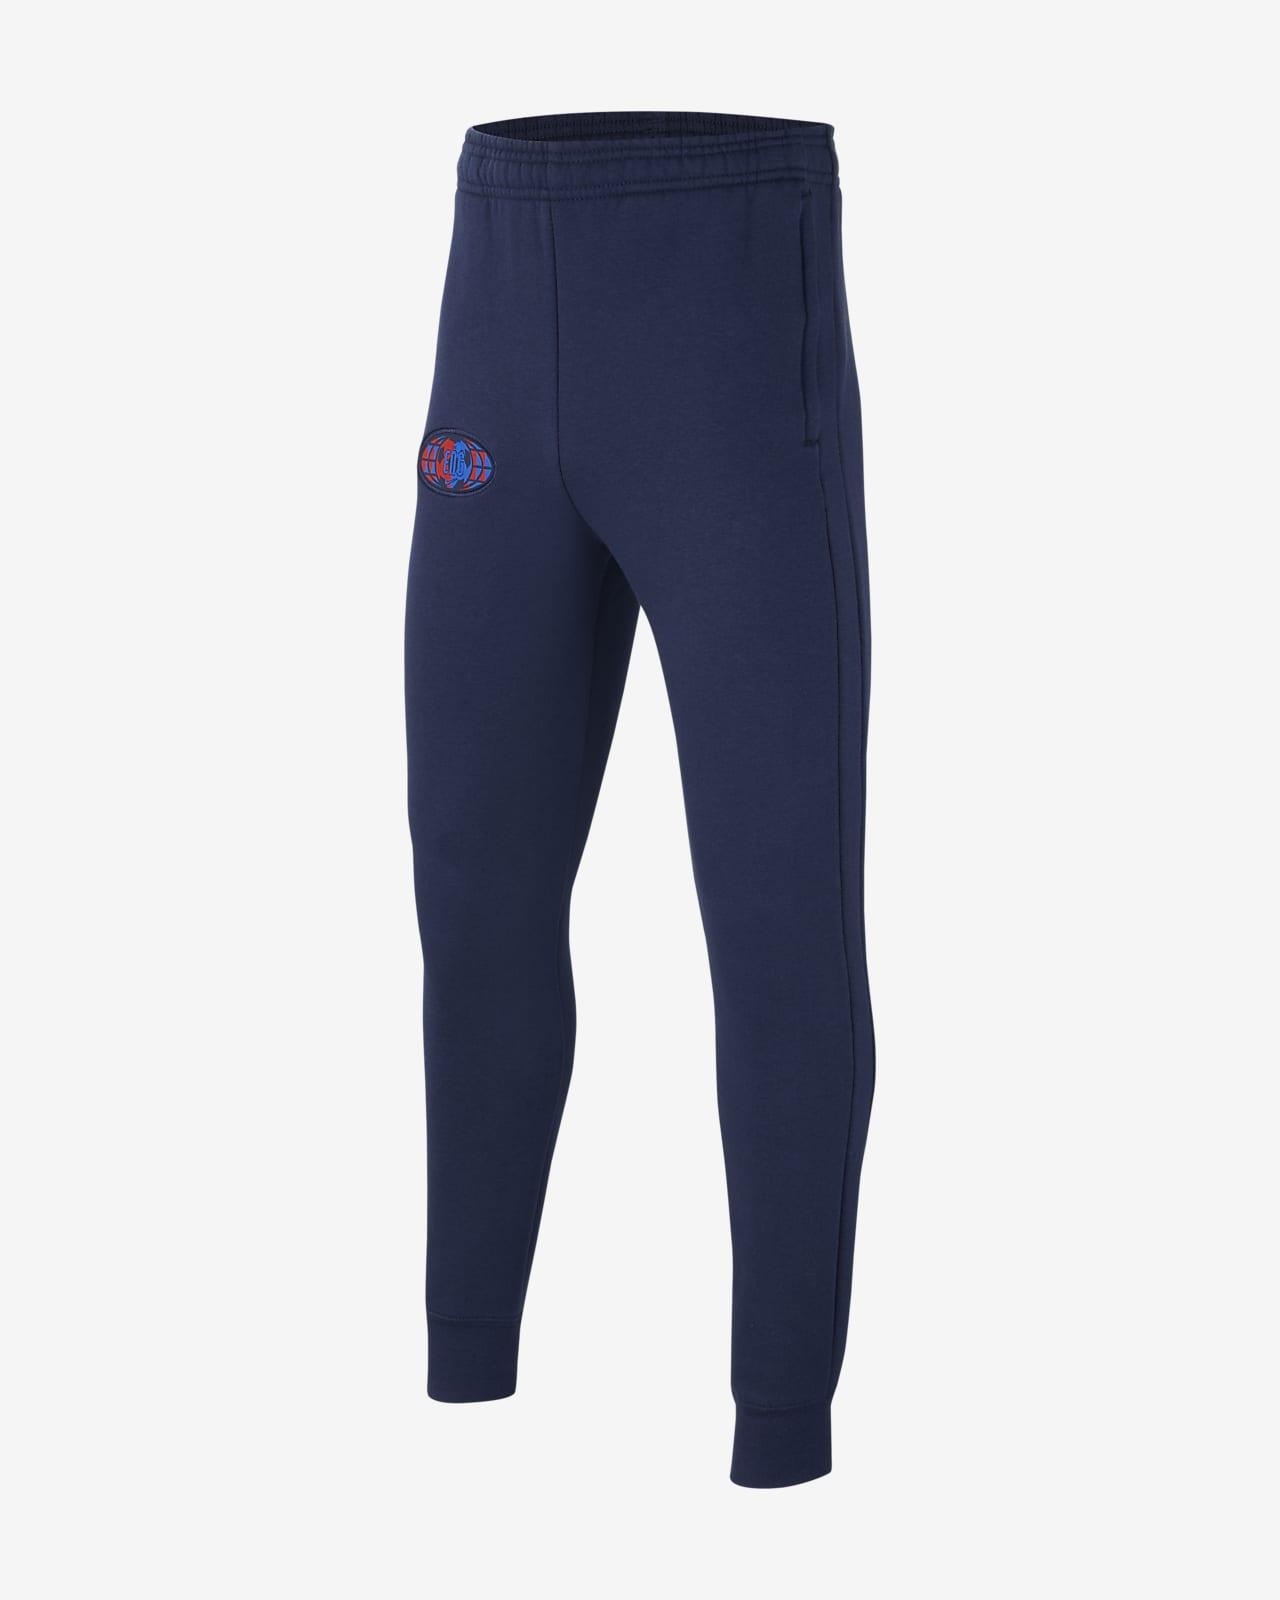 Pantalones de fútbol de tejido Fleece para niño talla grande Inglaterra